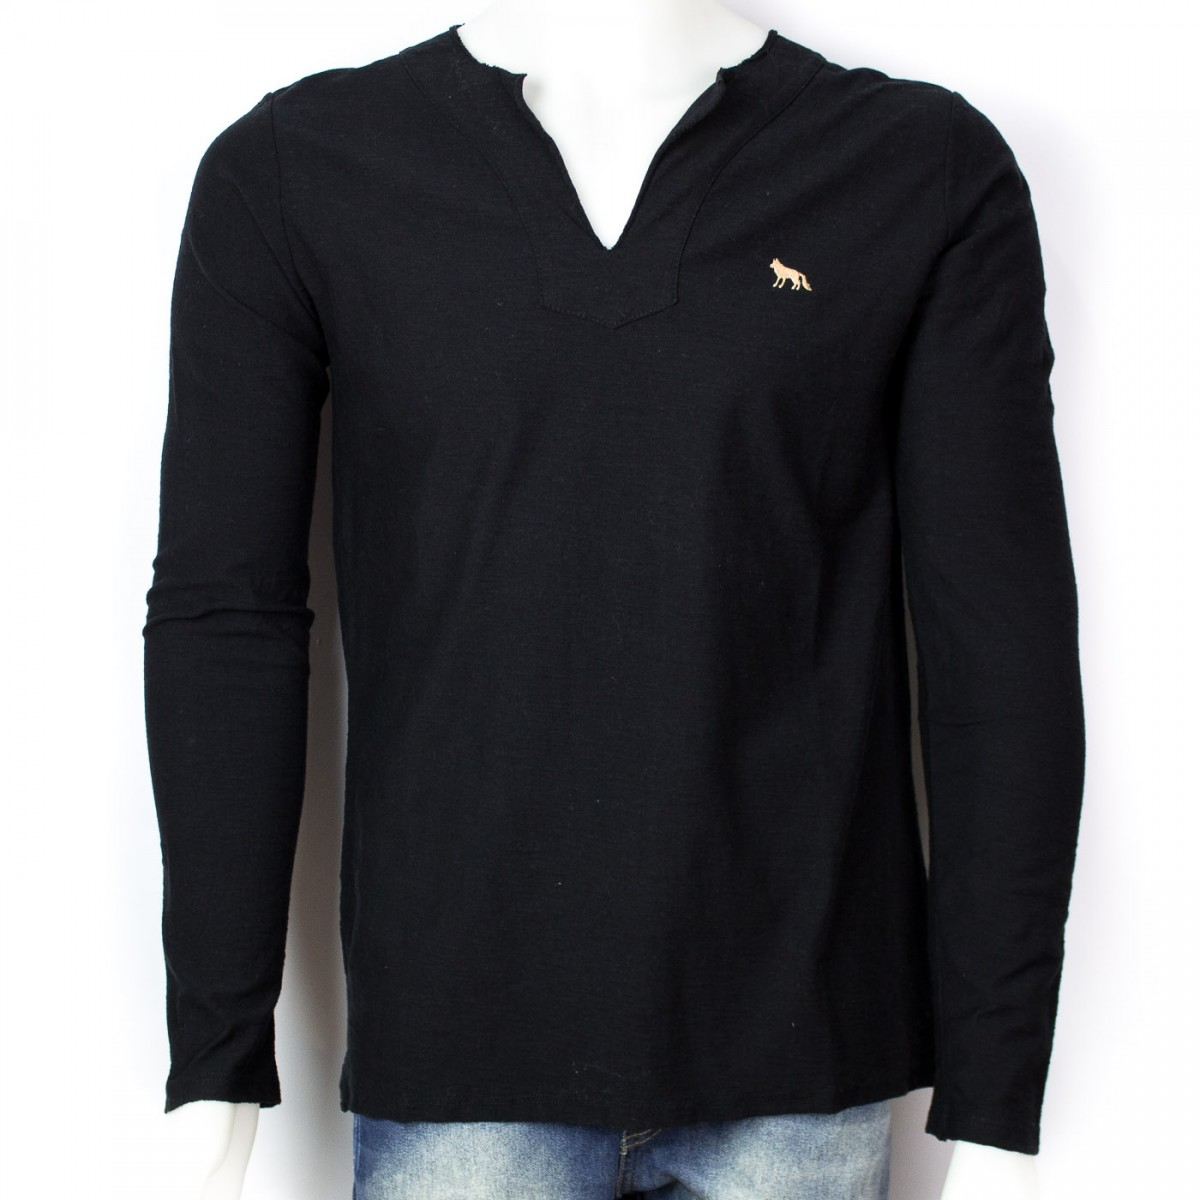 Bizz Store - Camiseta Bata Masculina Acostamento Manga Longa c66d62f6e3b9d